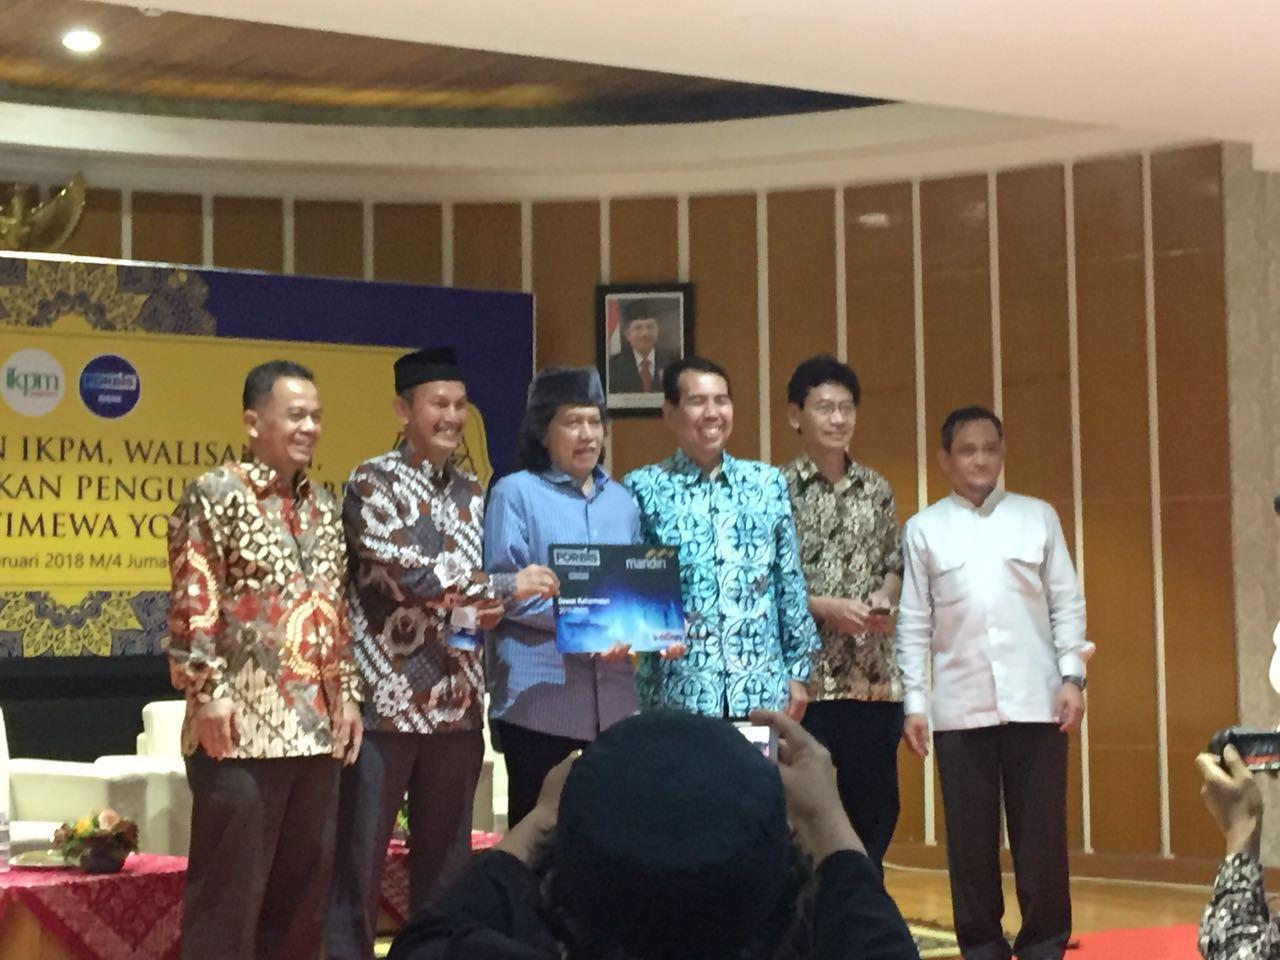 Pelantikan Forum Bisnis IKPM Gontor Wilayah Yogyakarta; Sebuah Model Pola Komunikasi dan Sinergi Antaralumni